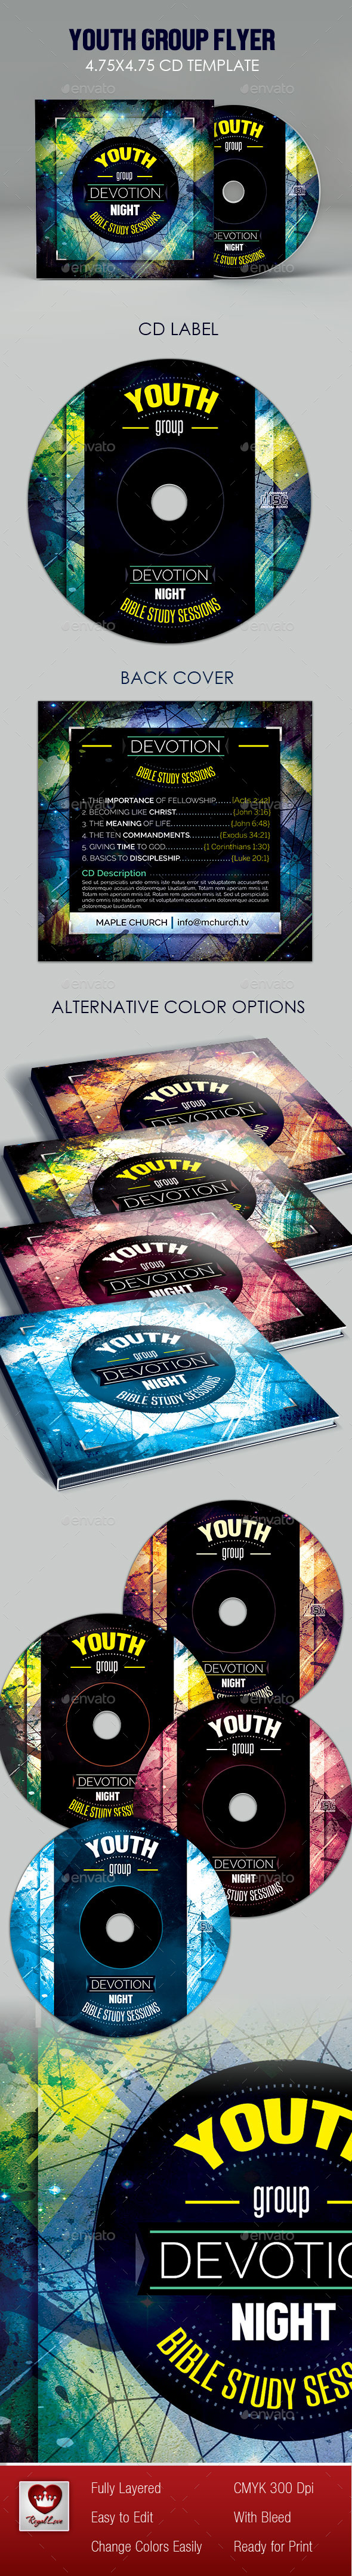 Youth Group CD Artwork - CD & DVD Artwork Print Templates